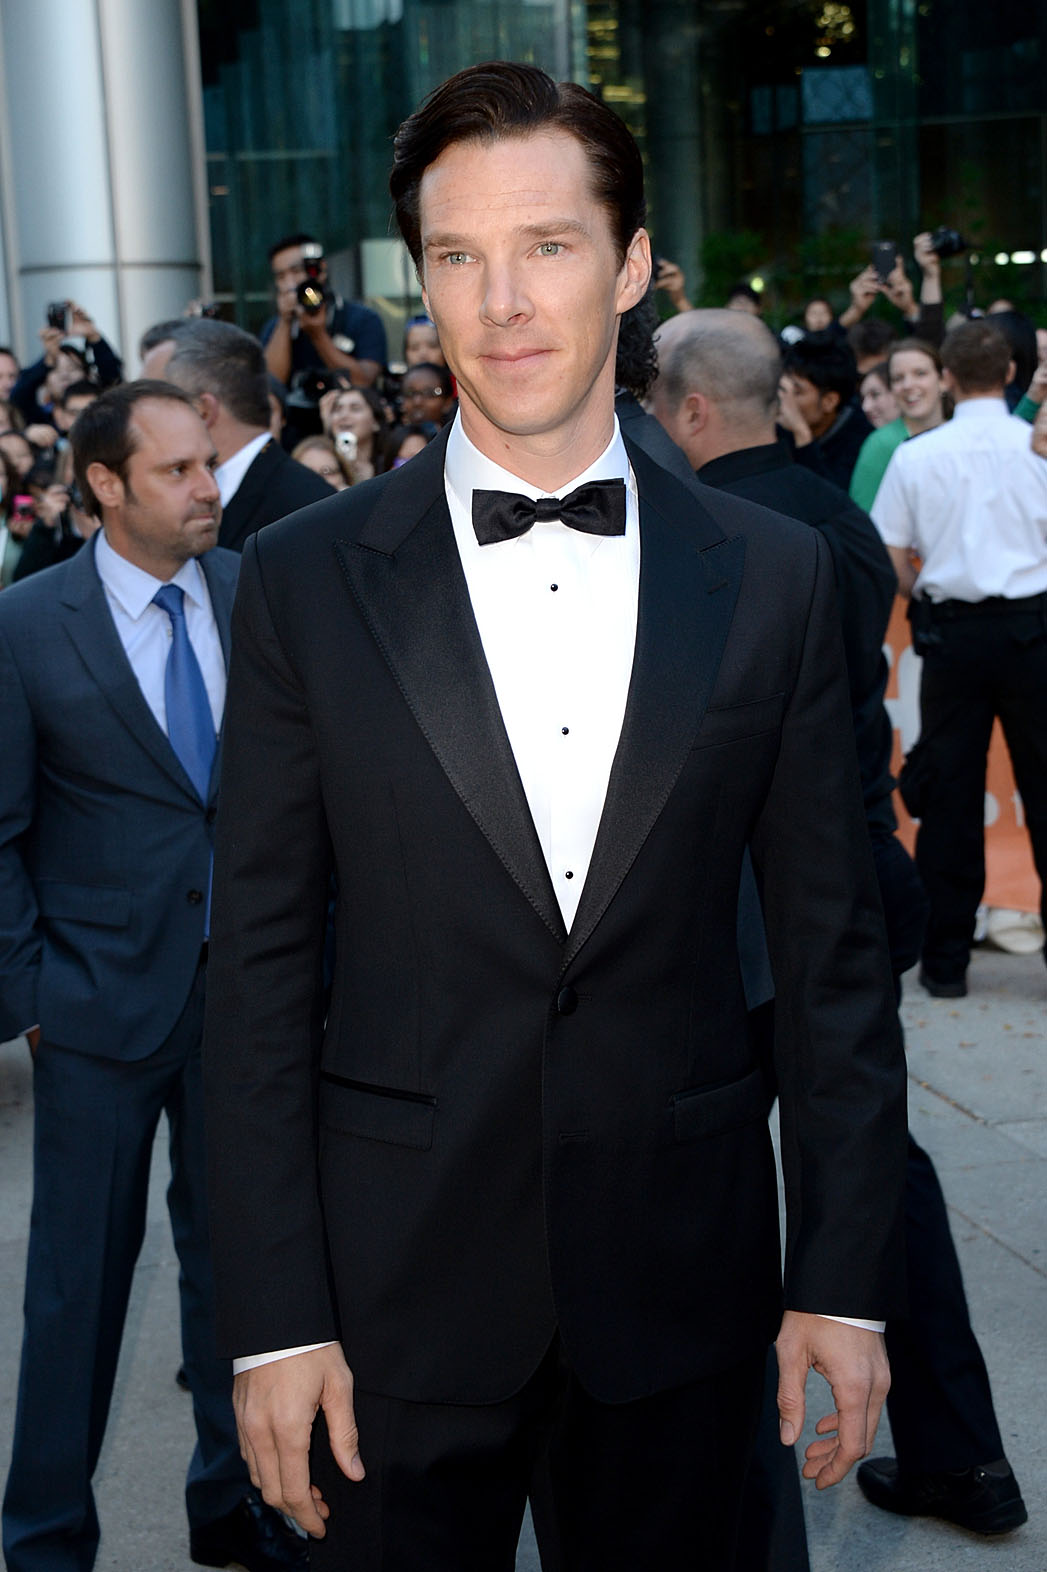 Benedict Cumberbatch Fifth Estate Premiere Toronto - P 2013